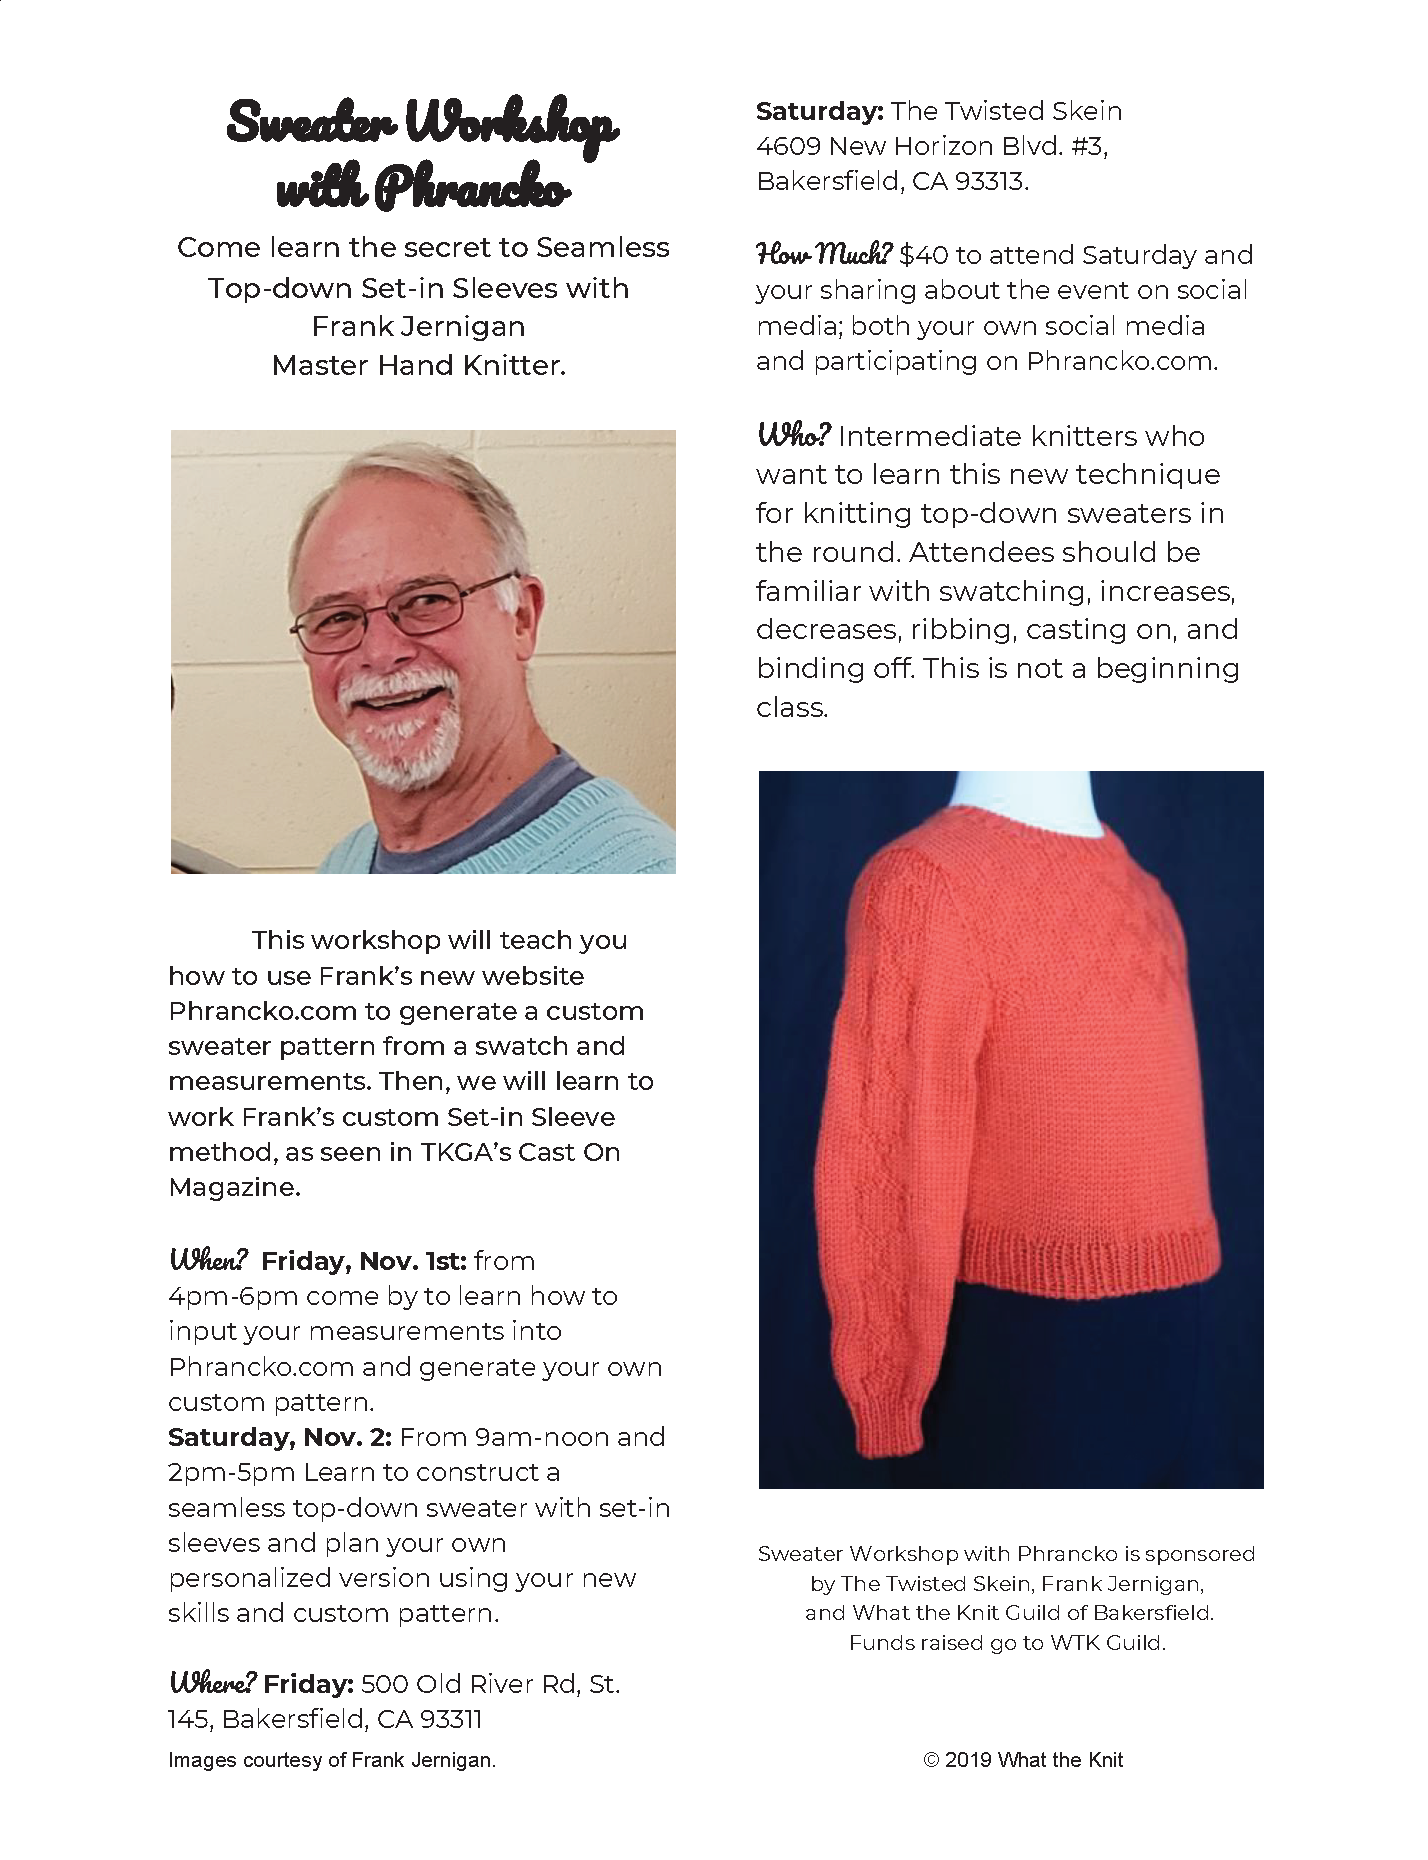 Sweater Workshop with Phrancko Flier.png